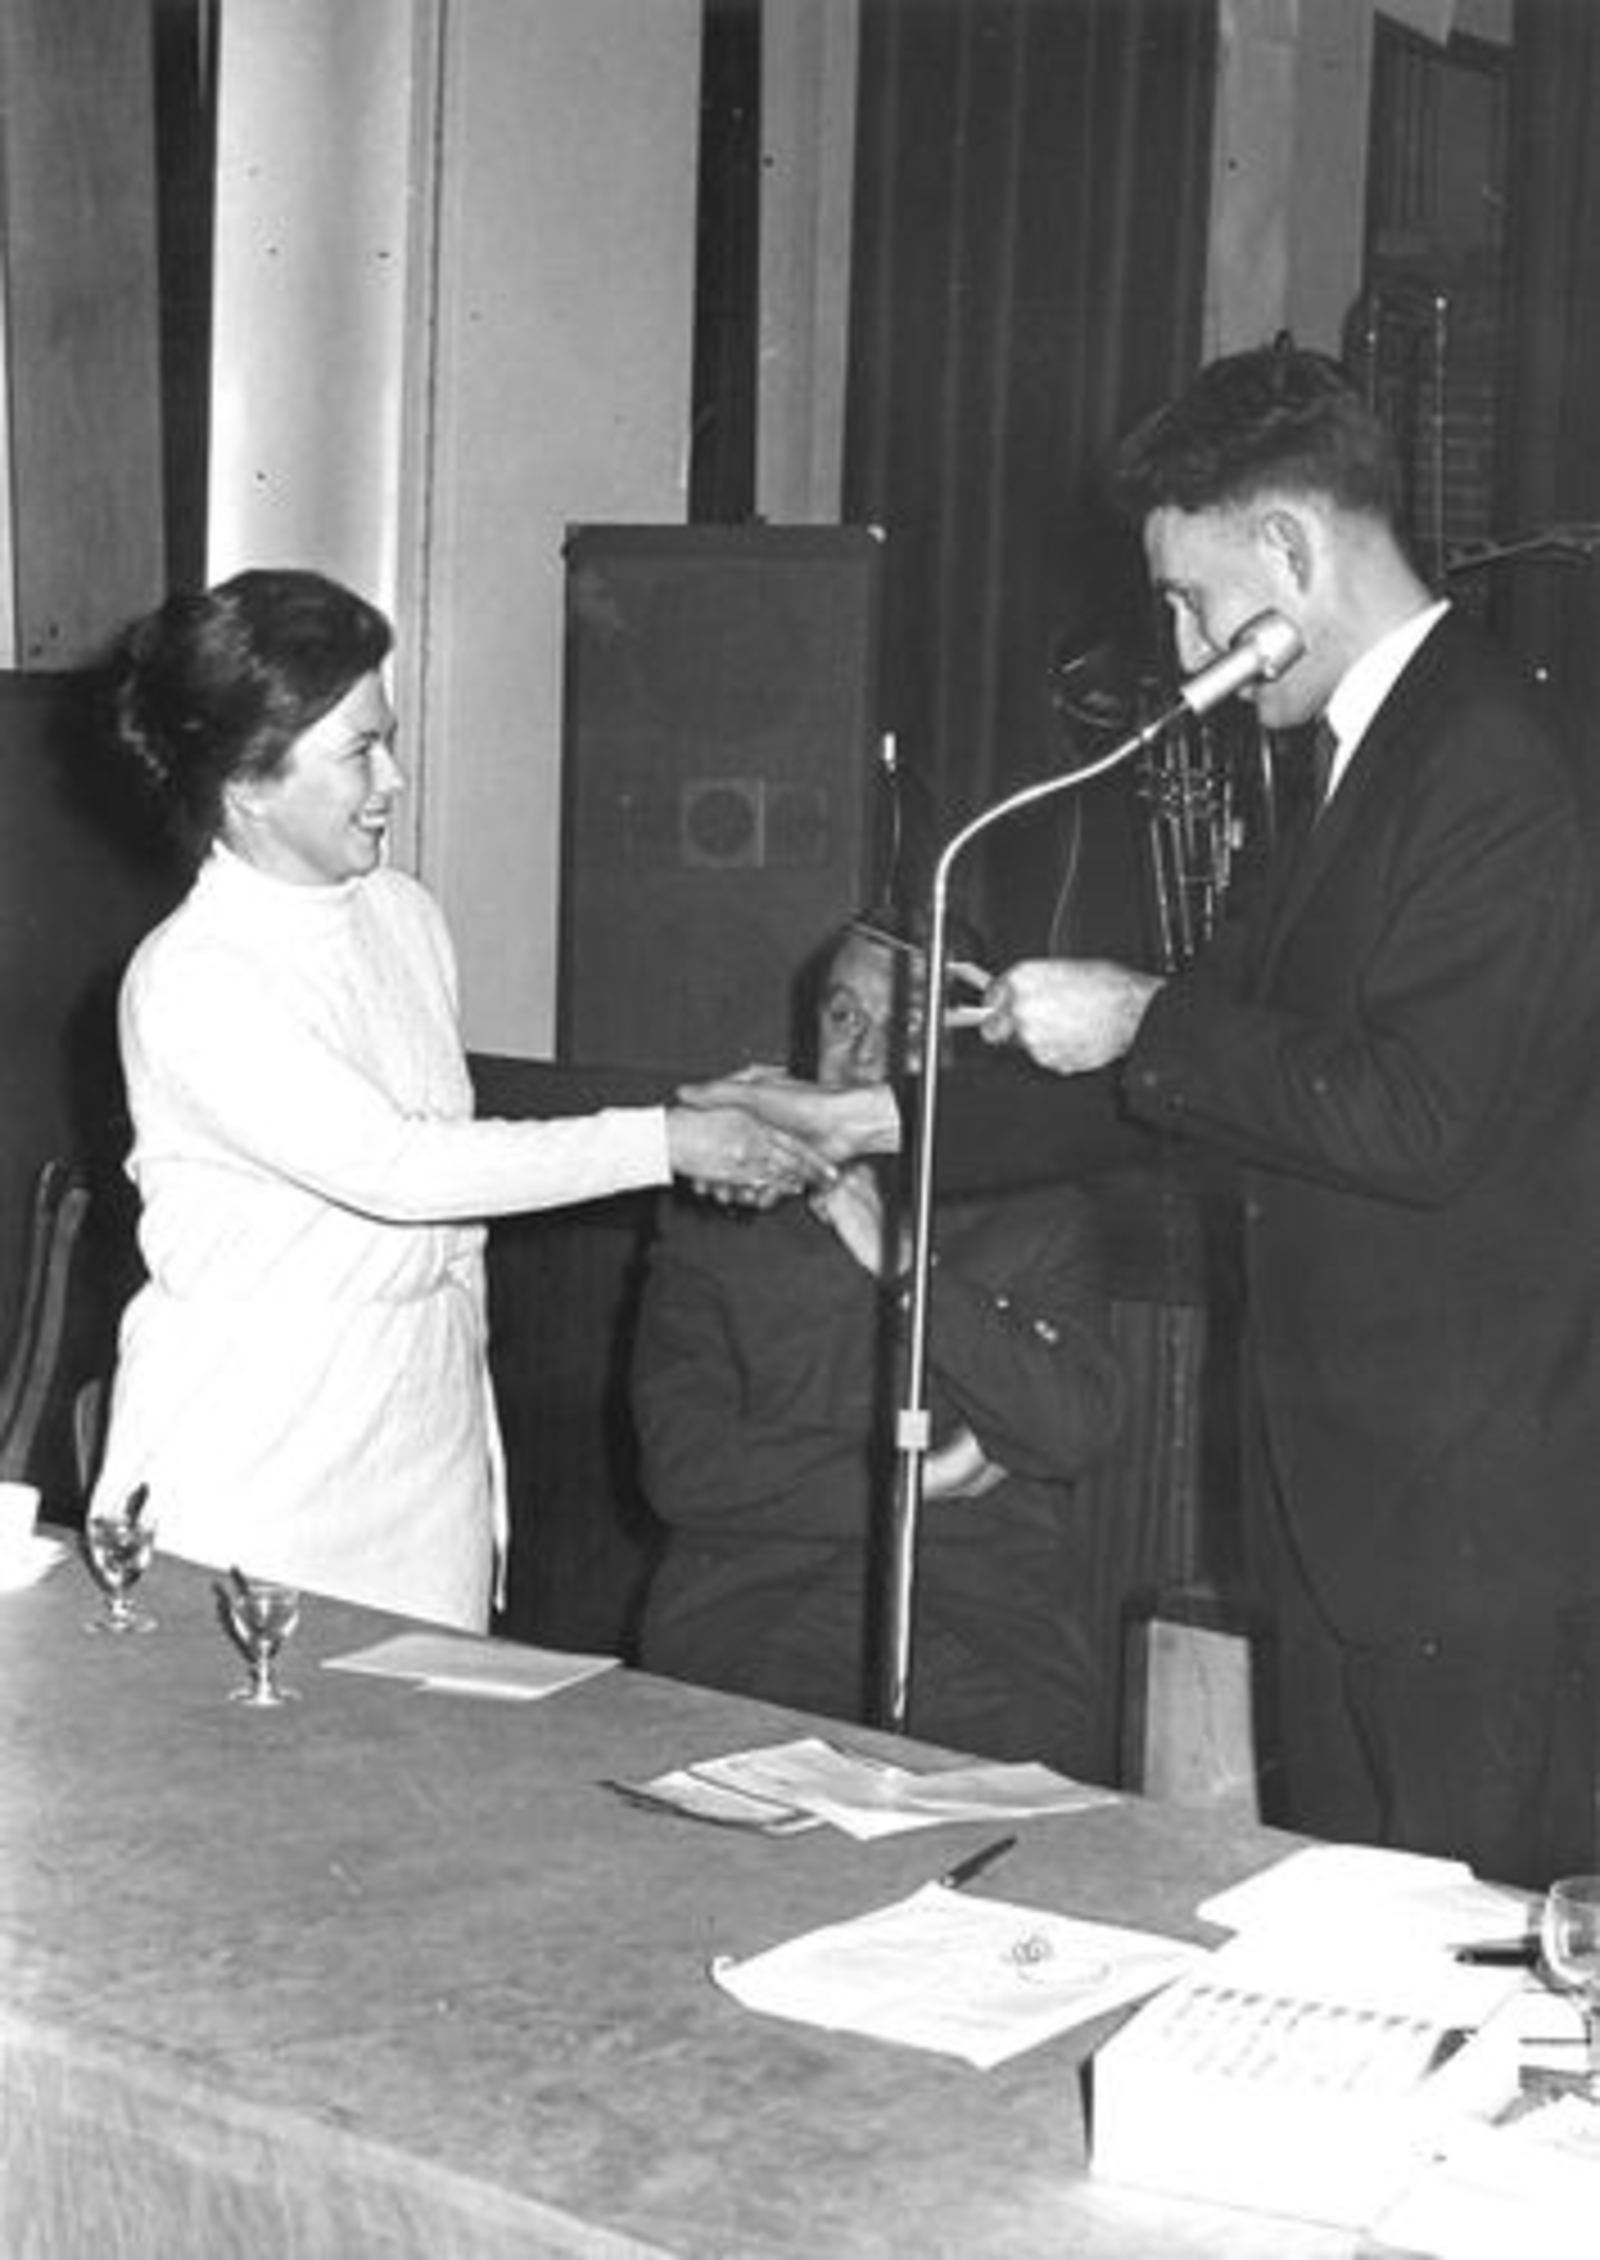 Onbekend Hoofddorp 1969-70± Winkeliersvereniging 31